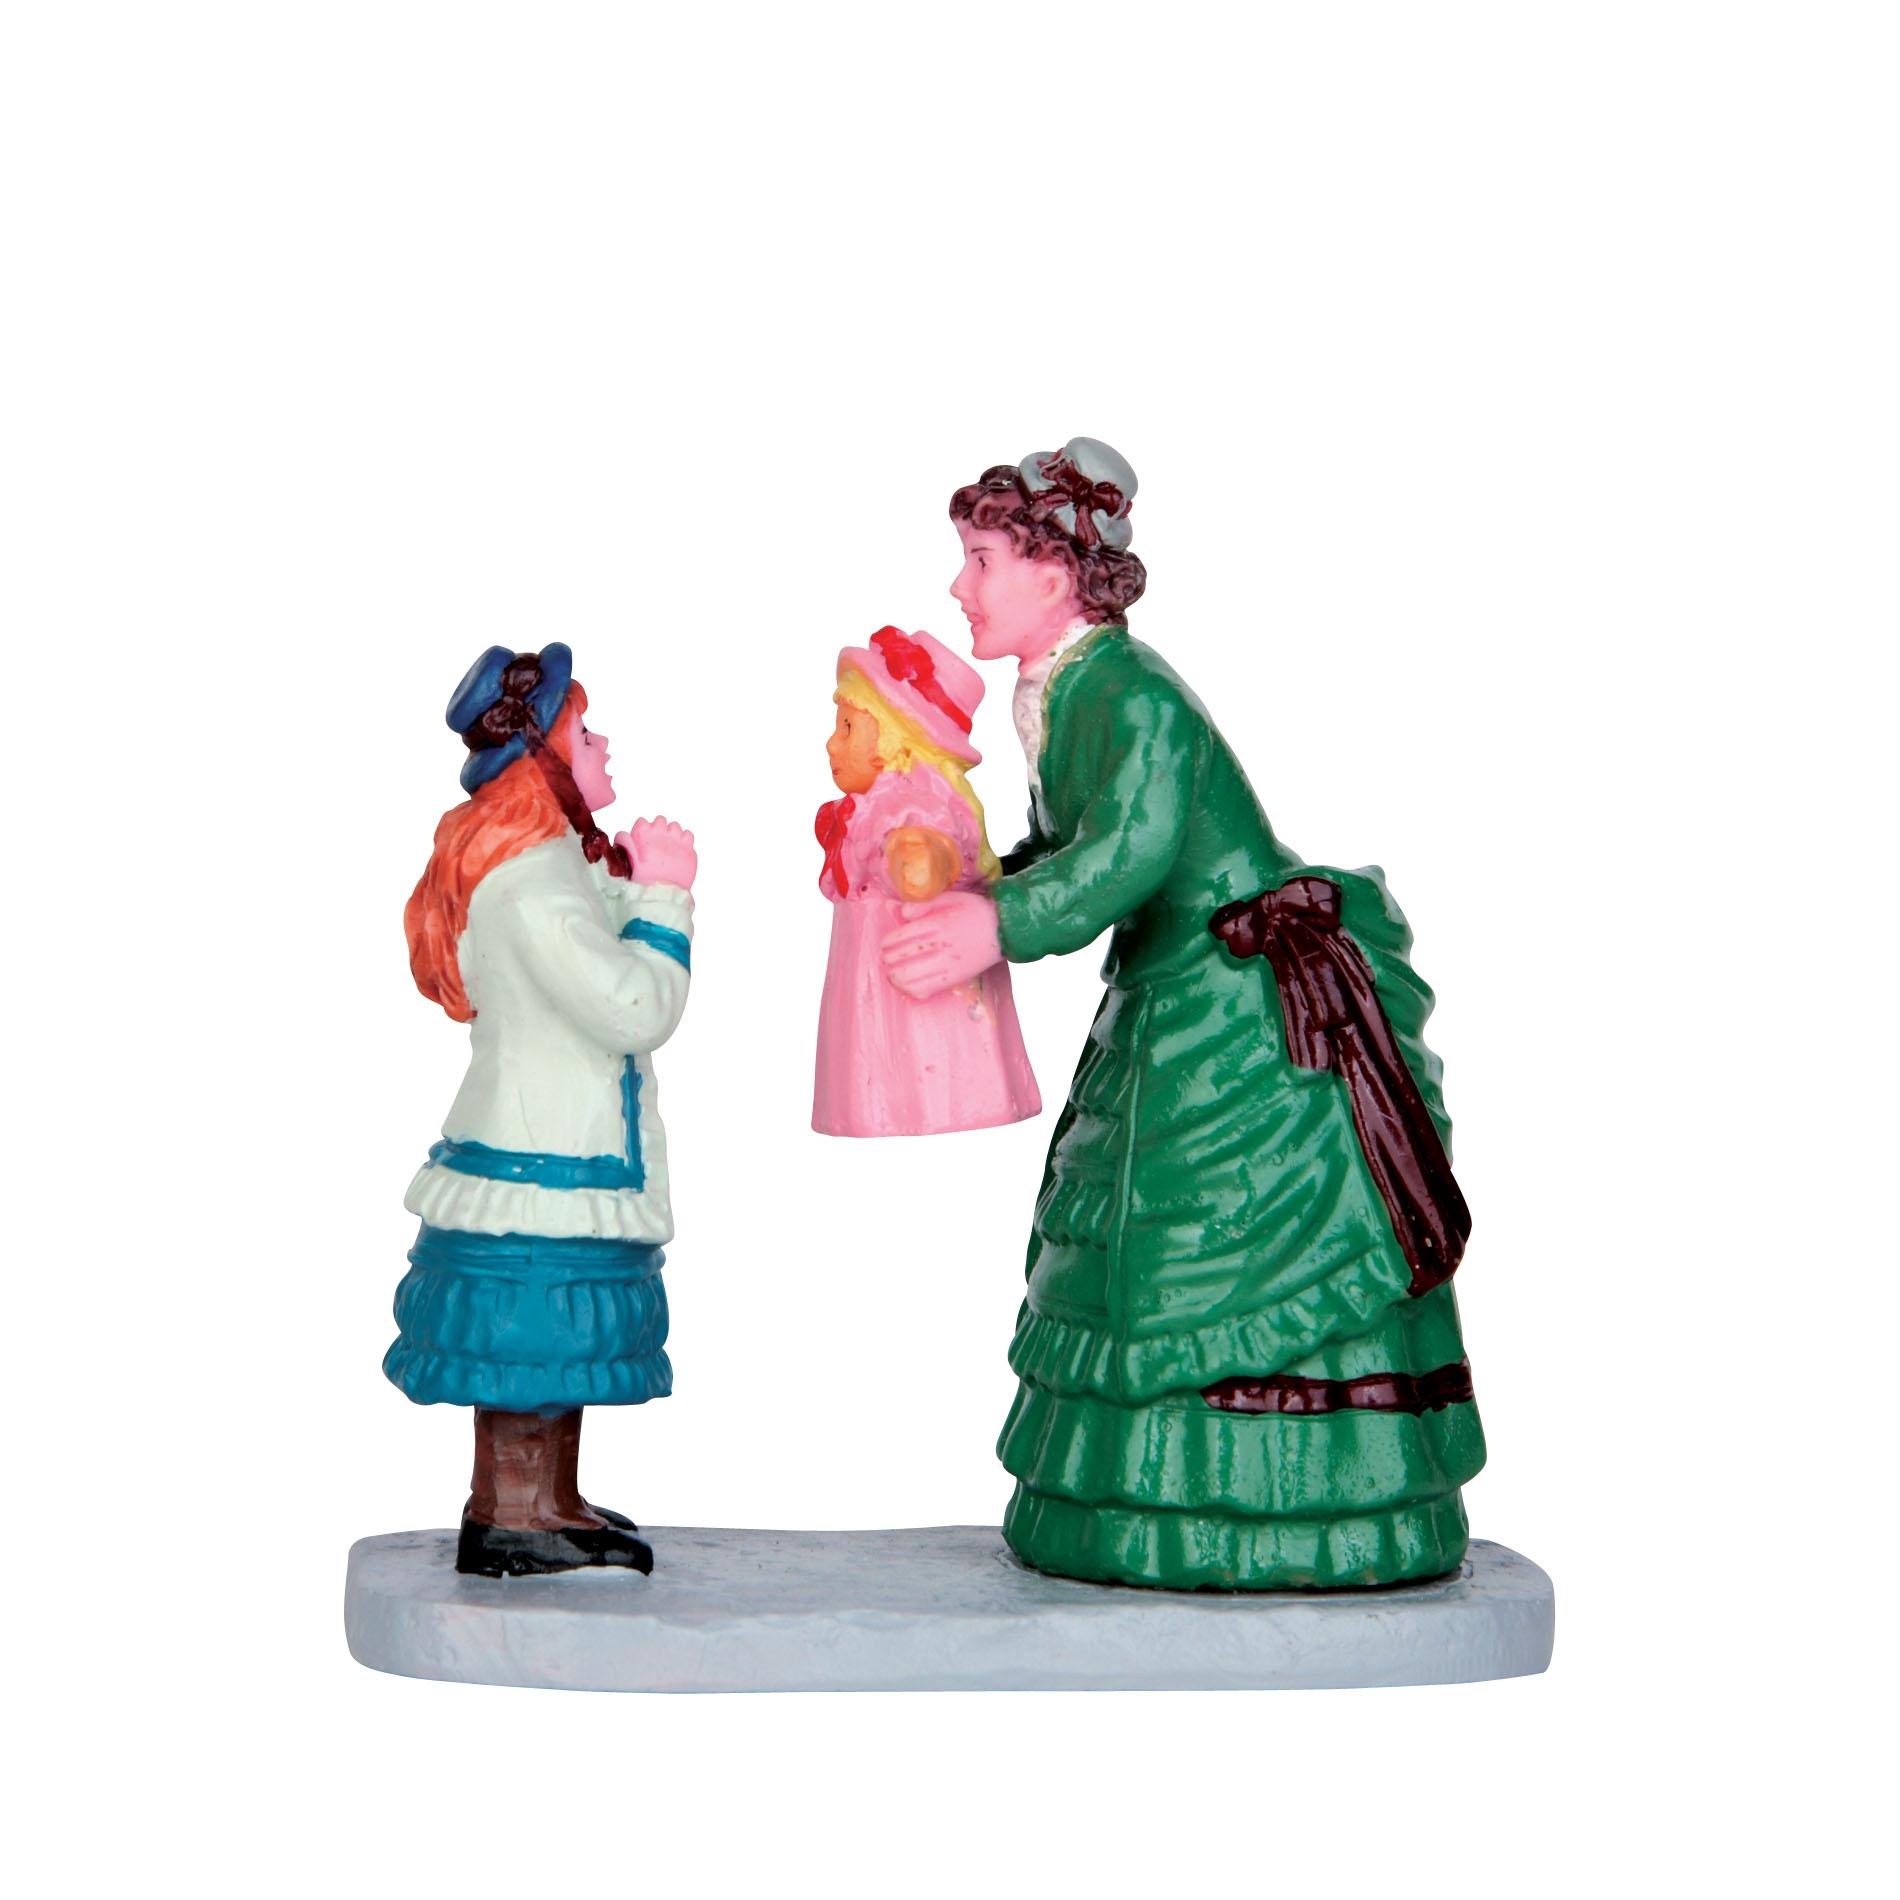 Lemax Village Collection Christmas Village Figurine New